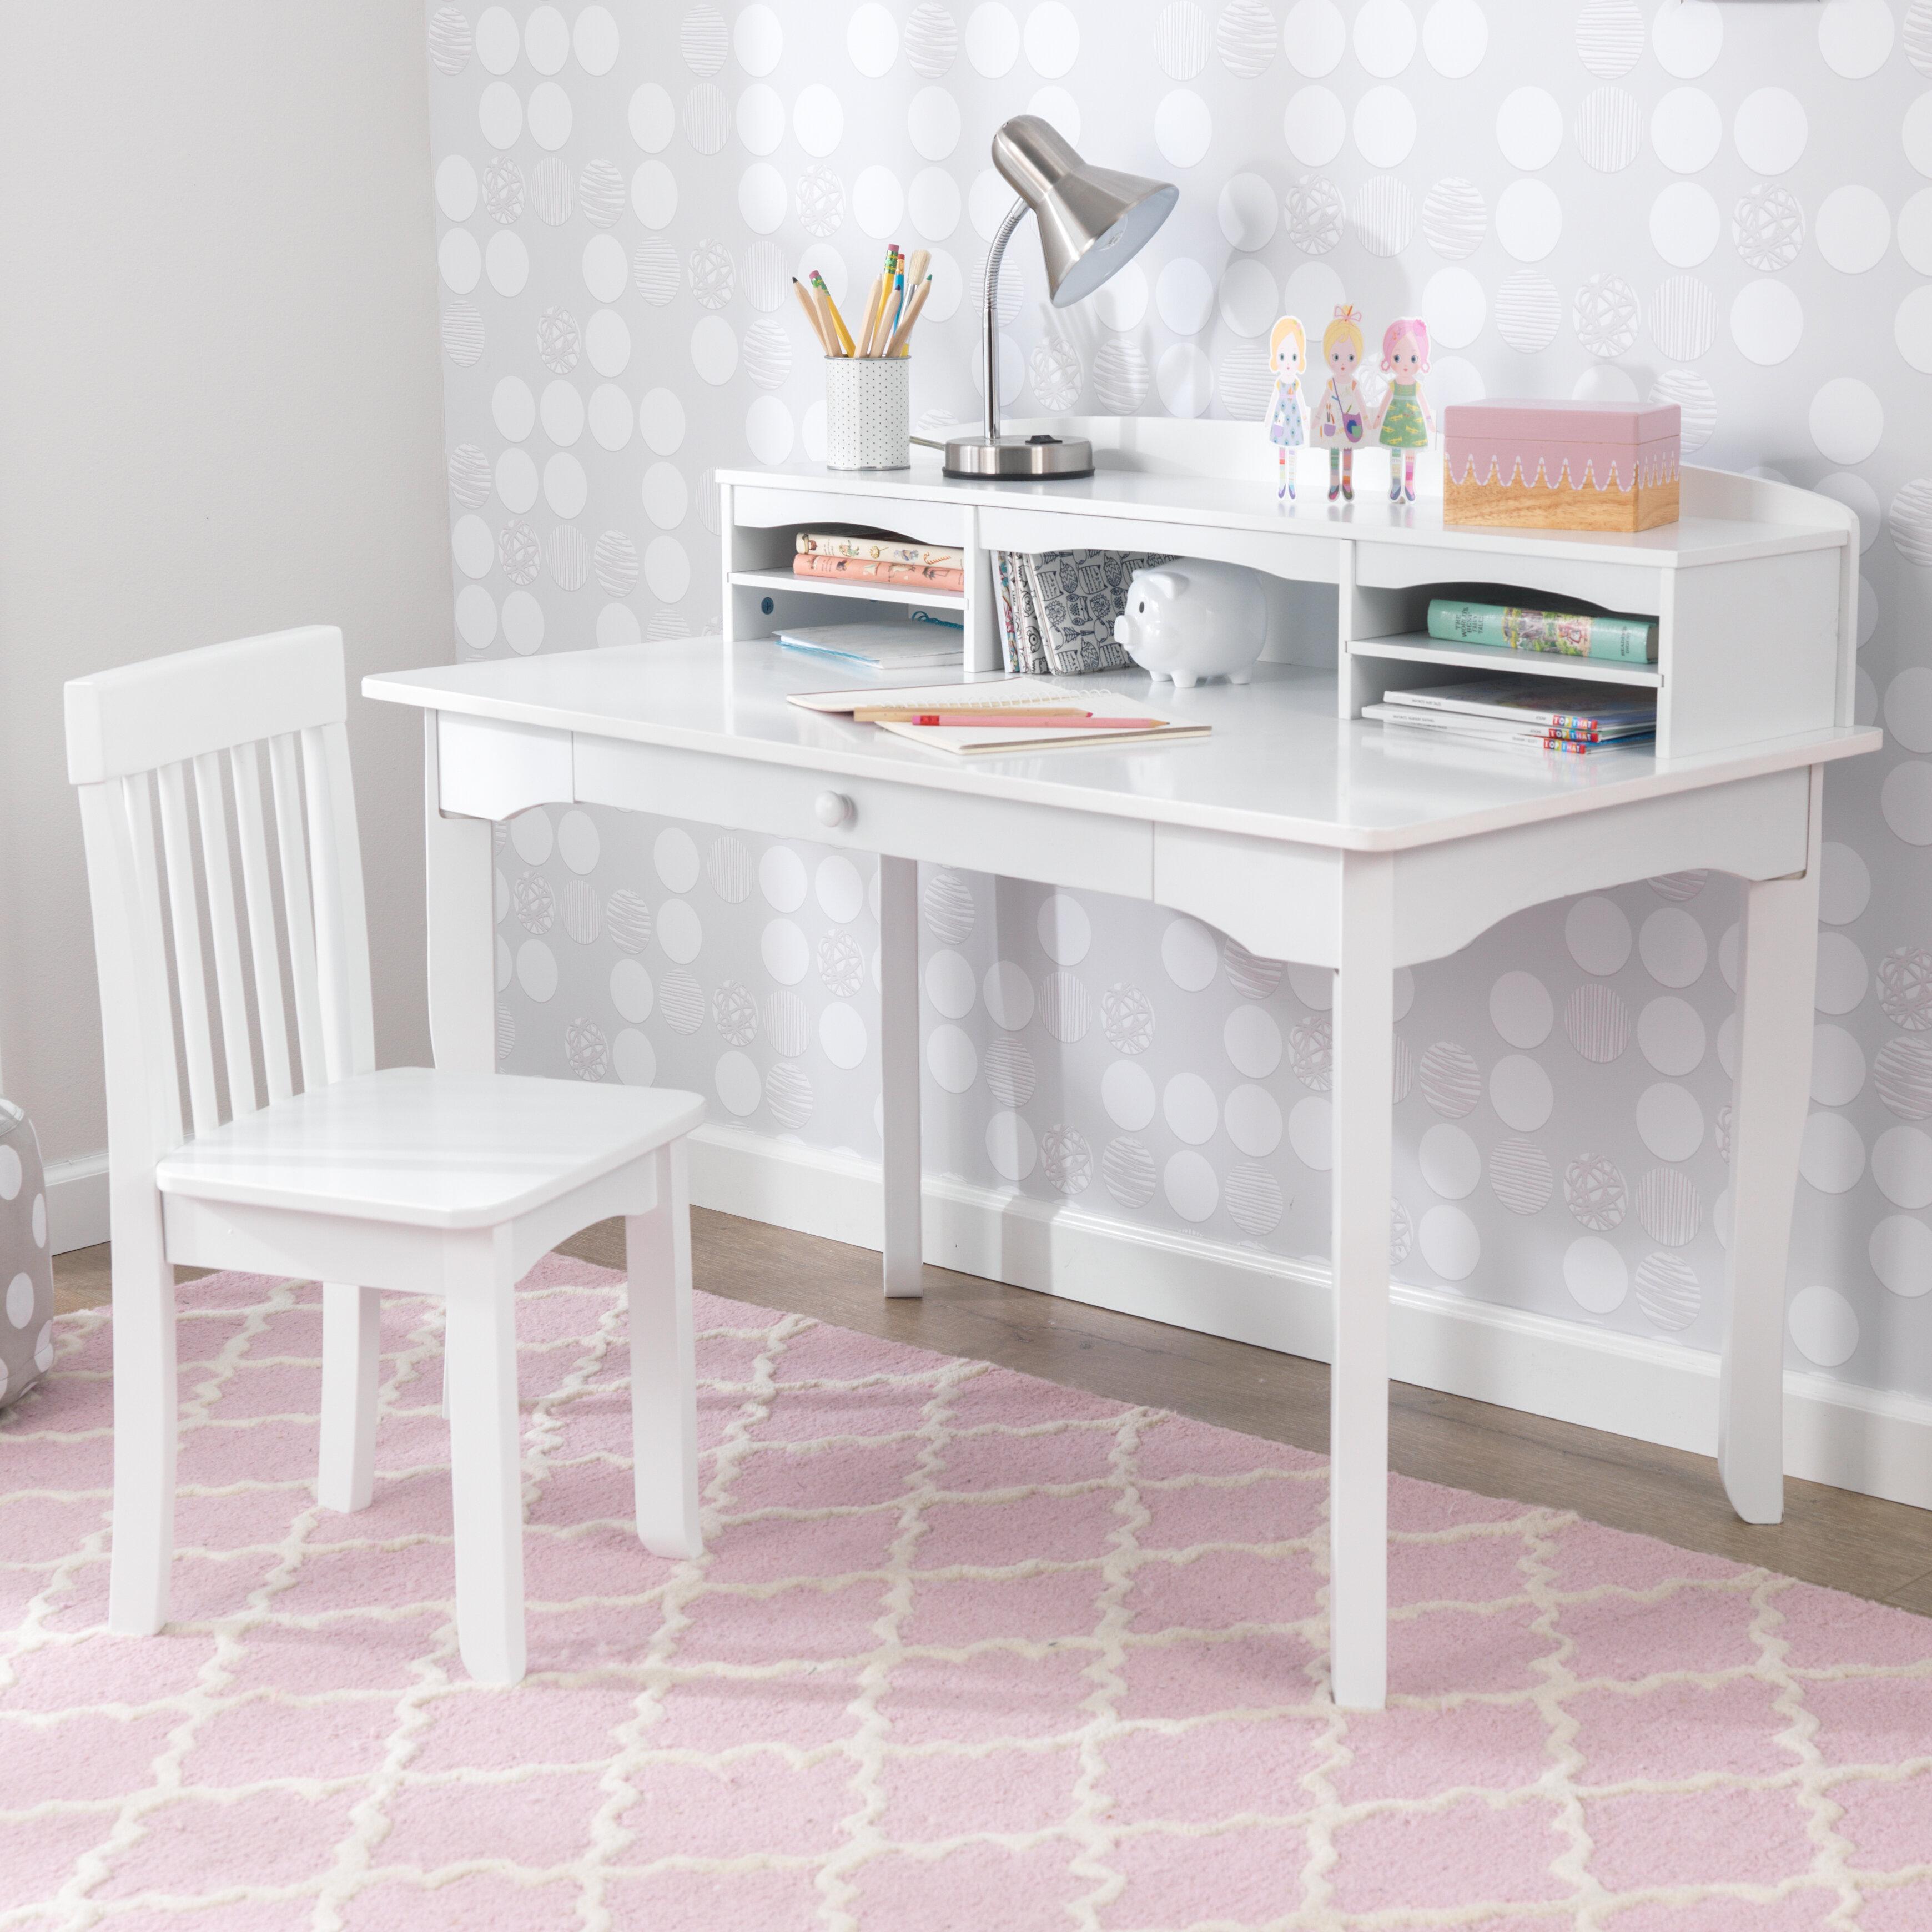 Prime Kidkraft Avalon Kids Study Desk And Chair Set With Kids Ncnpc Chair Design For Home Ncnpcorg